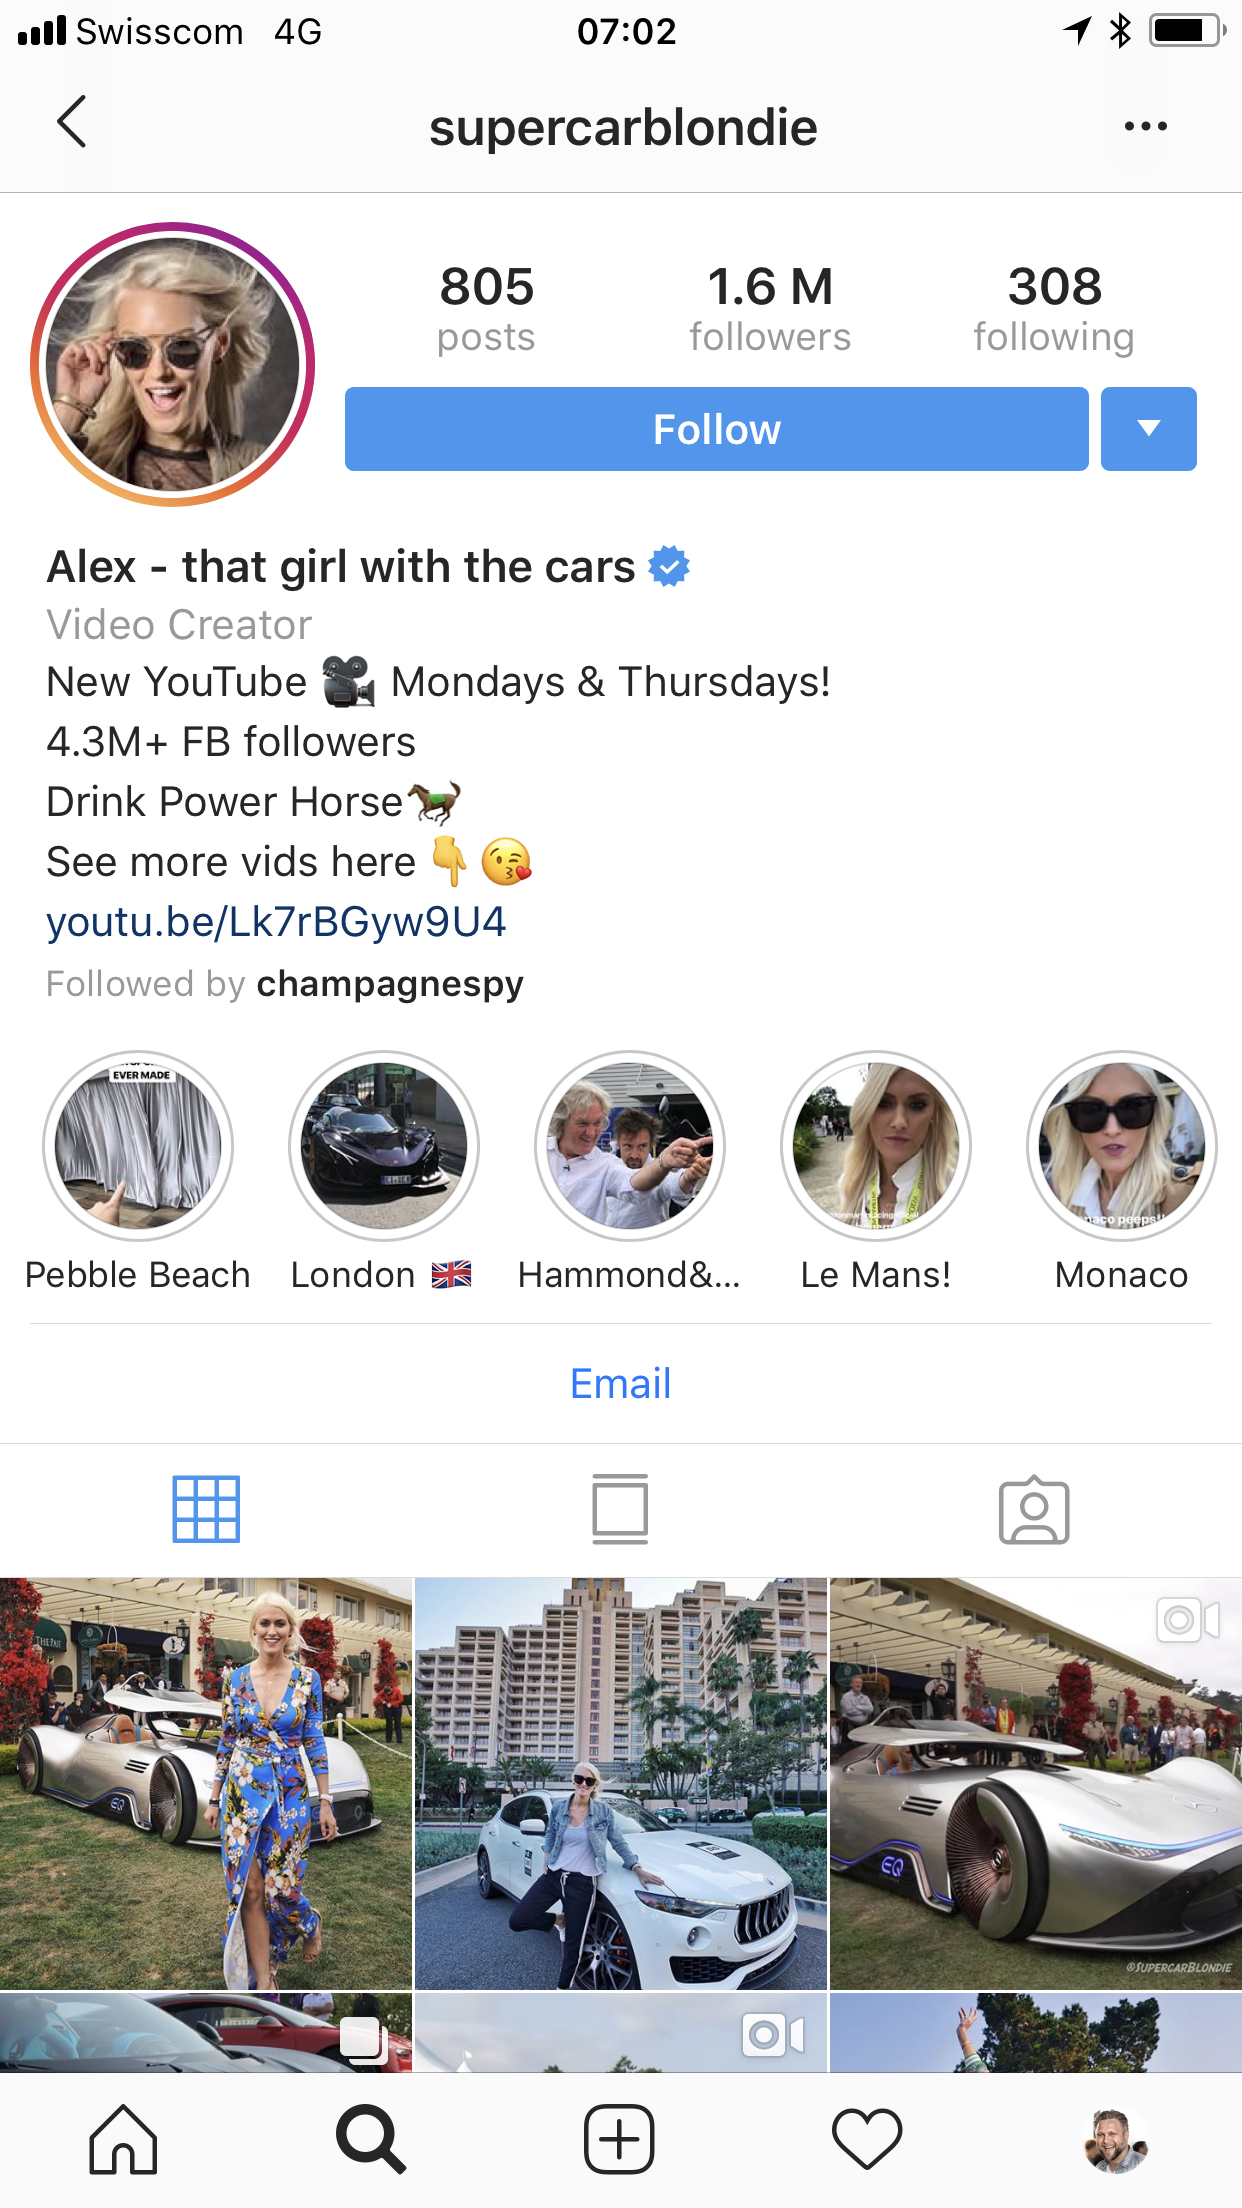 Dan_Roznov_Instagram_Storytelling_digitalEVENT2018_5.png